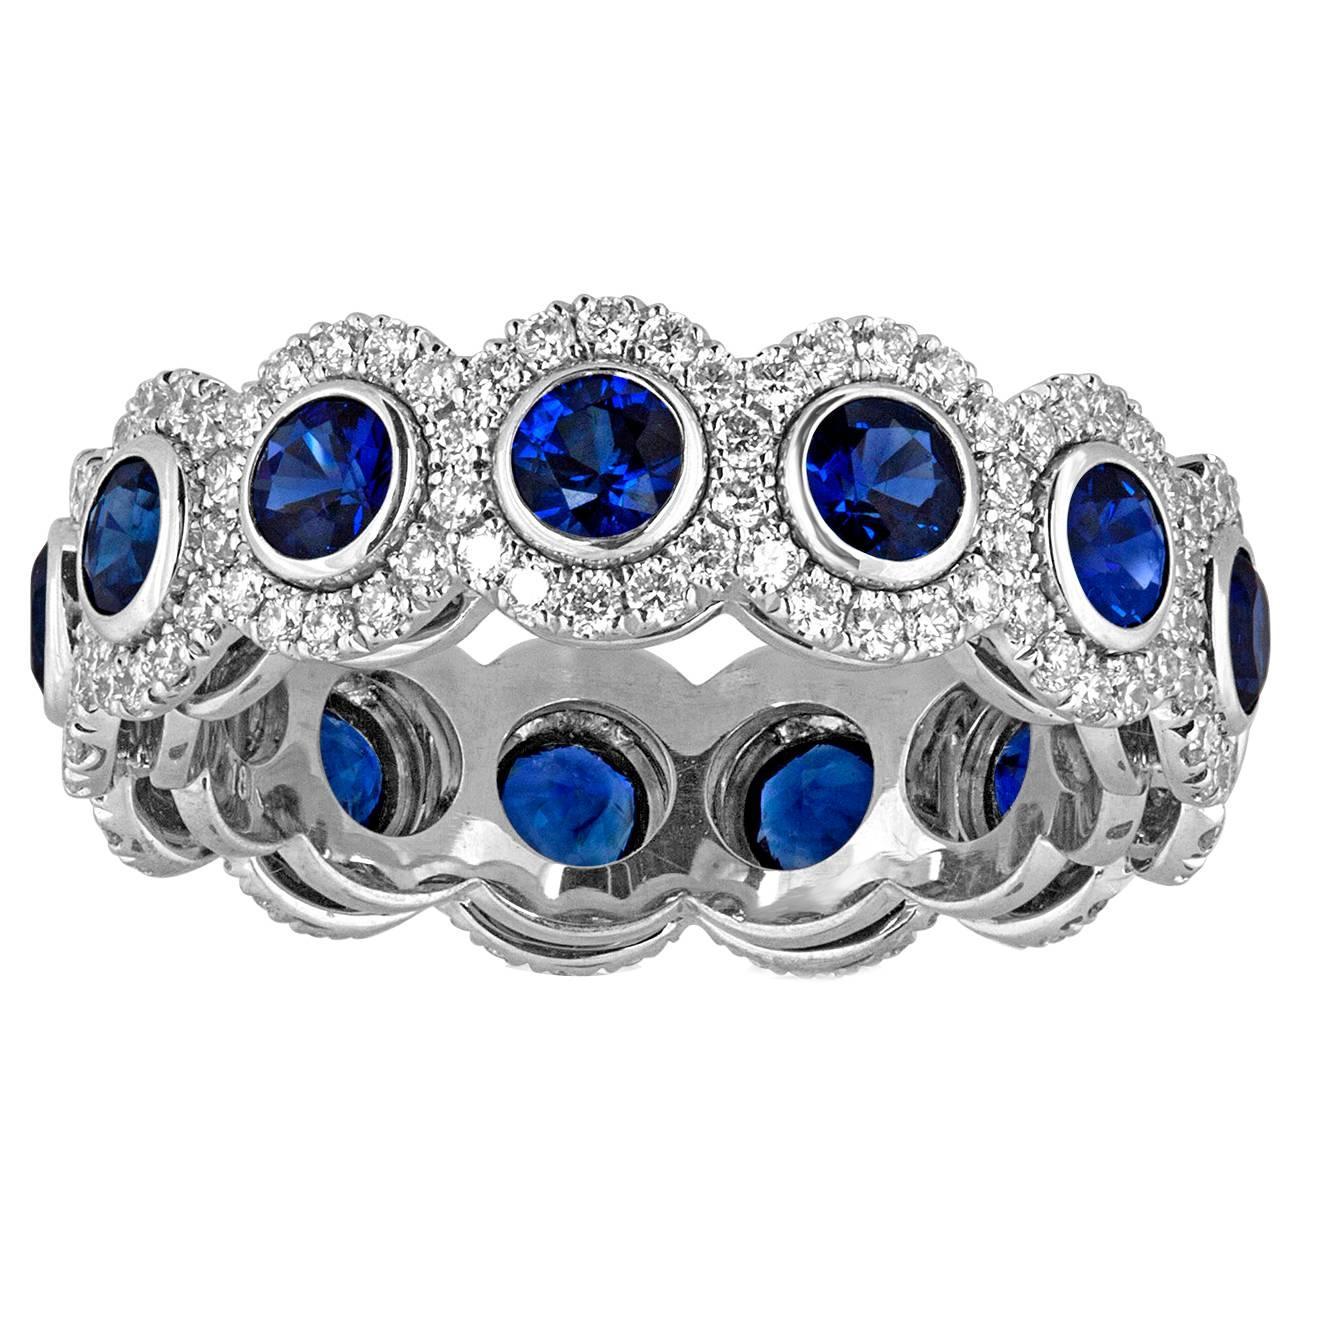 4.12 Carats Eternity Blue Sapphire Diamond Gold Band Ring